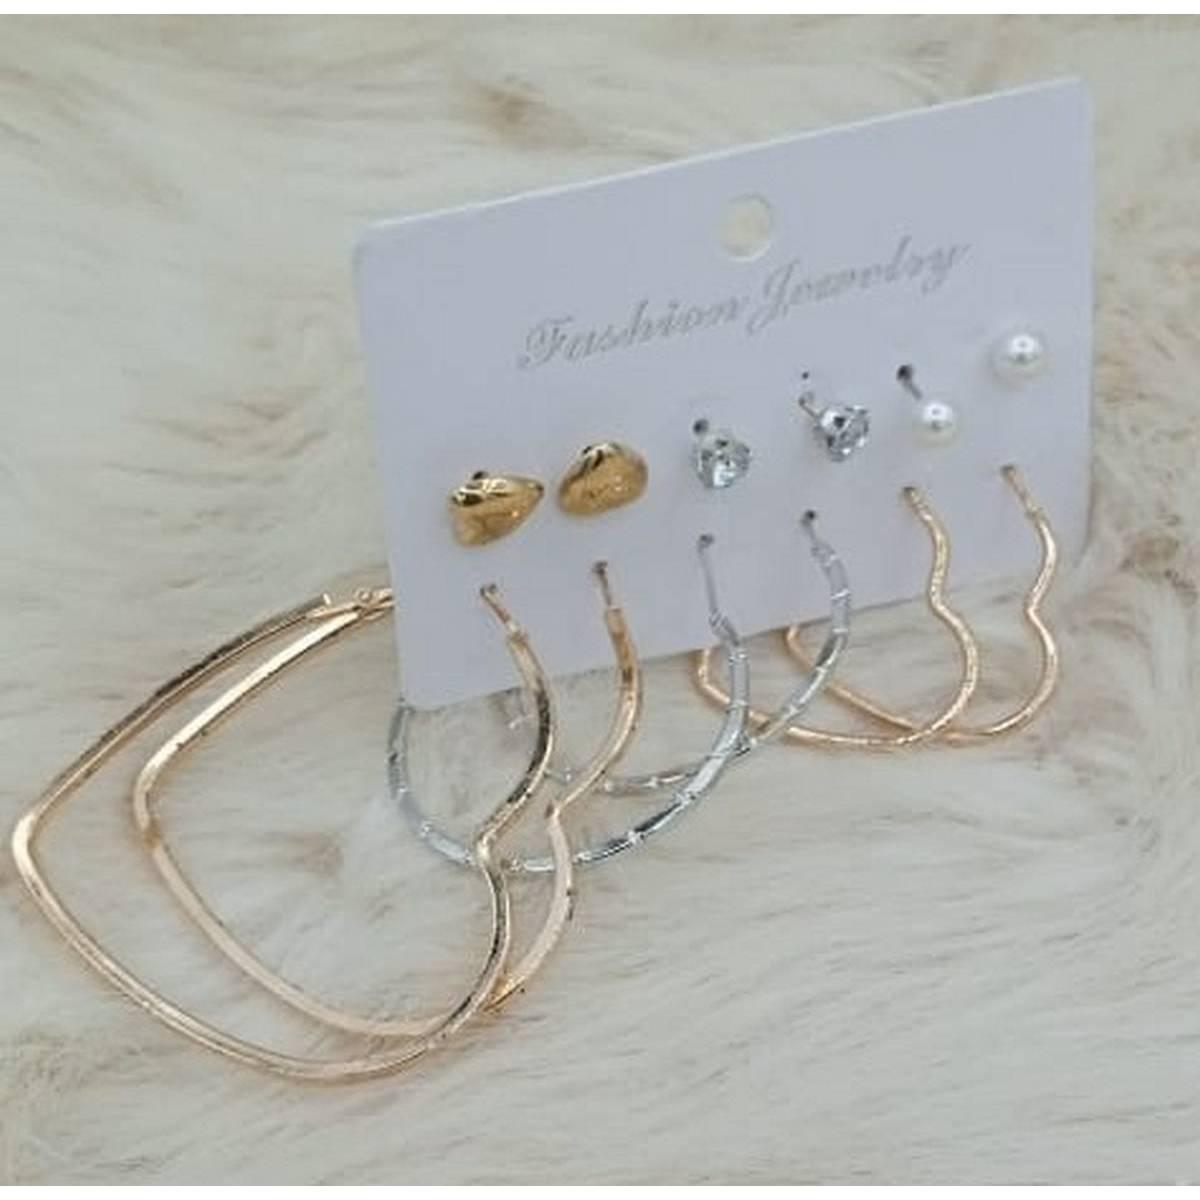 Amazing Big 6 pairs/sets Hoop Earring Stud Earring Fashion For Women Girl Jewelry Earring ( 3 Bali & 3 Tops )